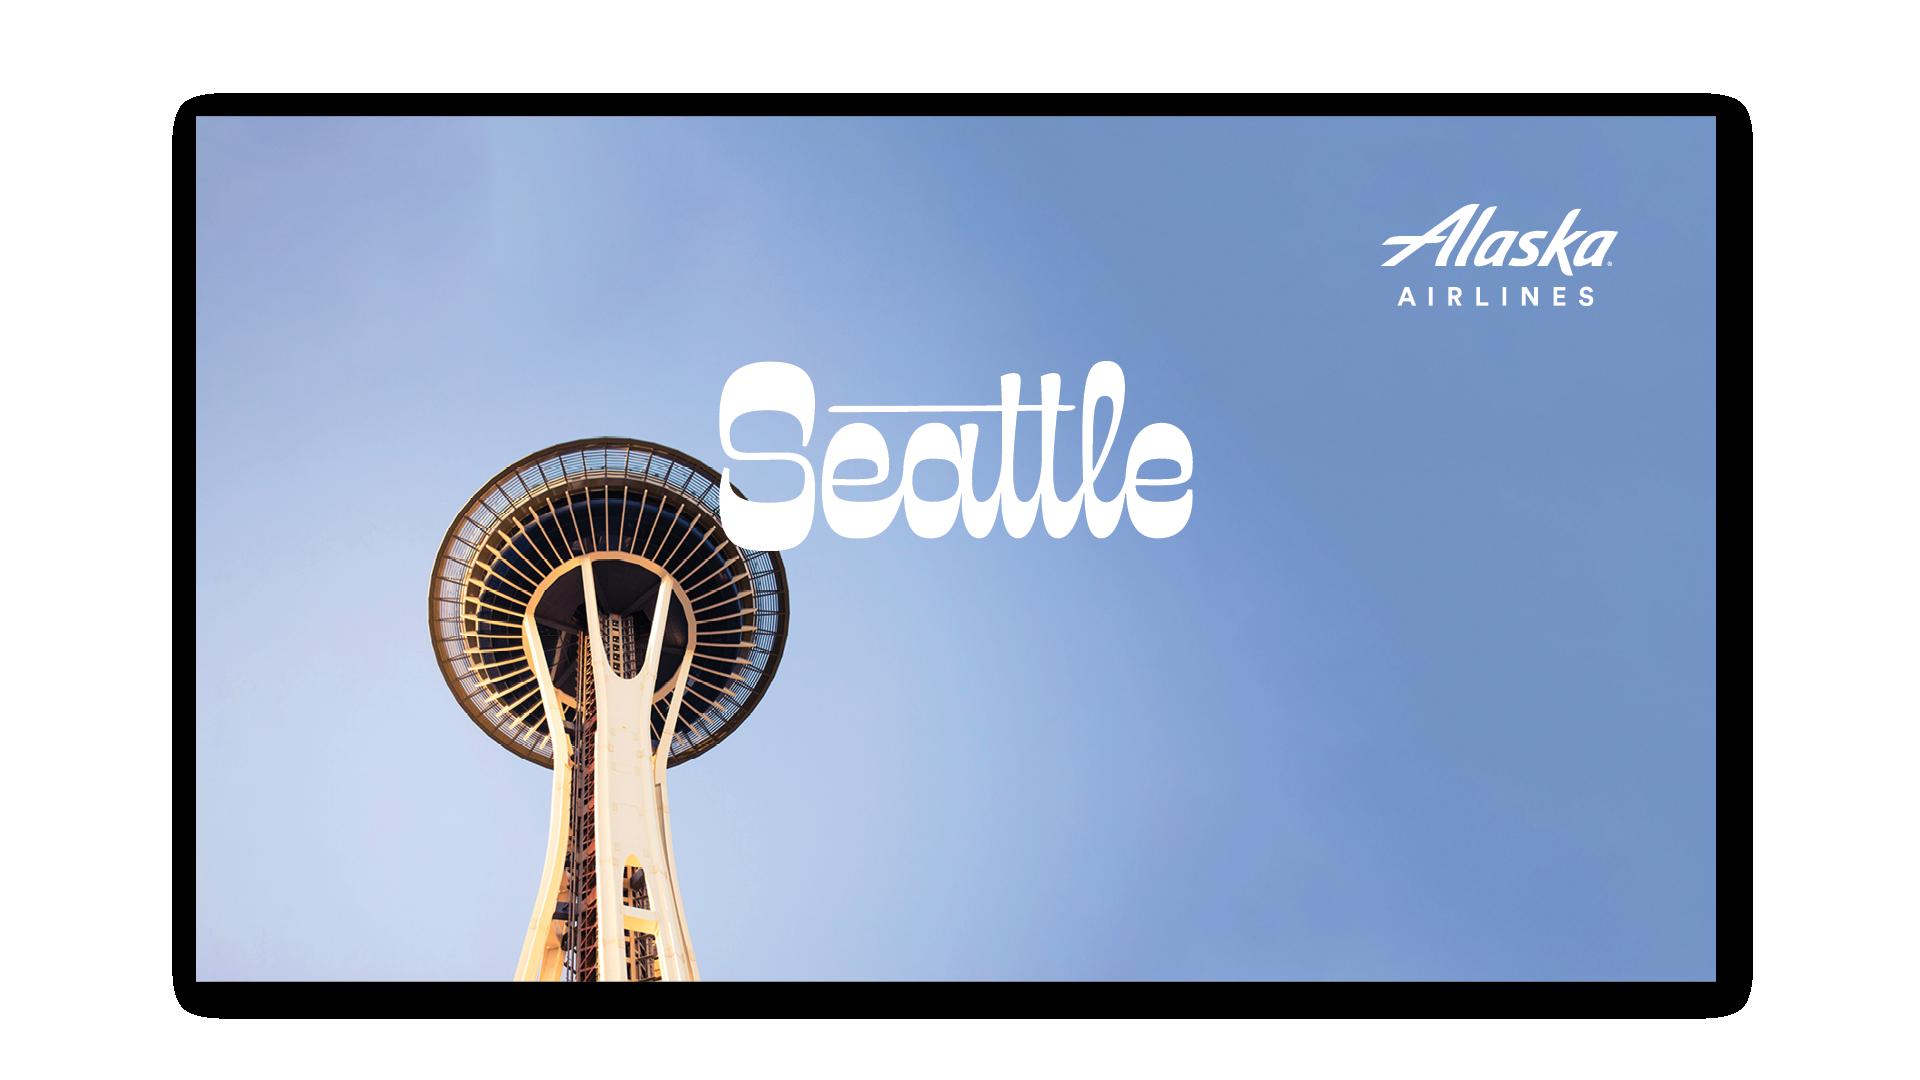 Alaska-Air_Brand-Photos-for-Film-Intro6.png